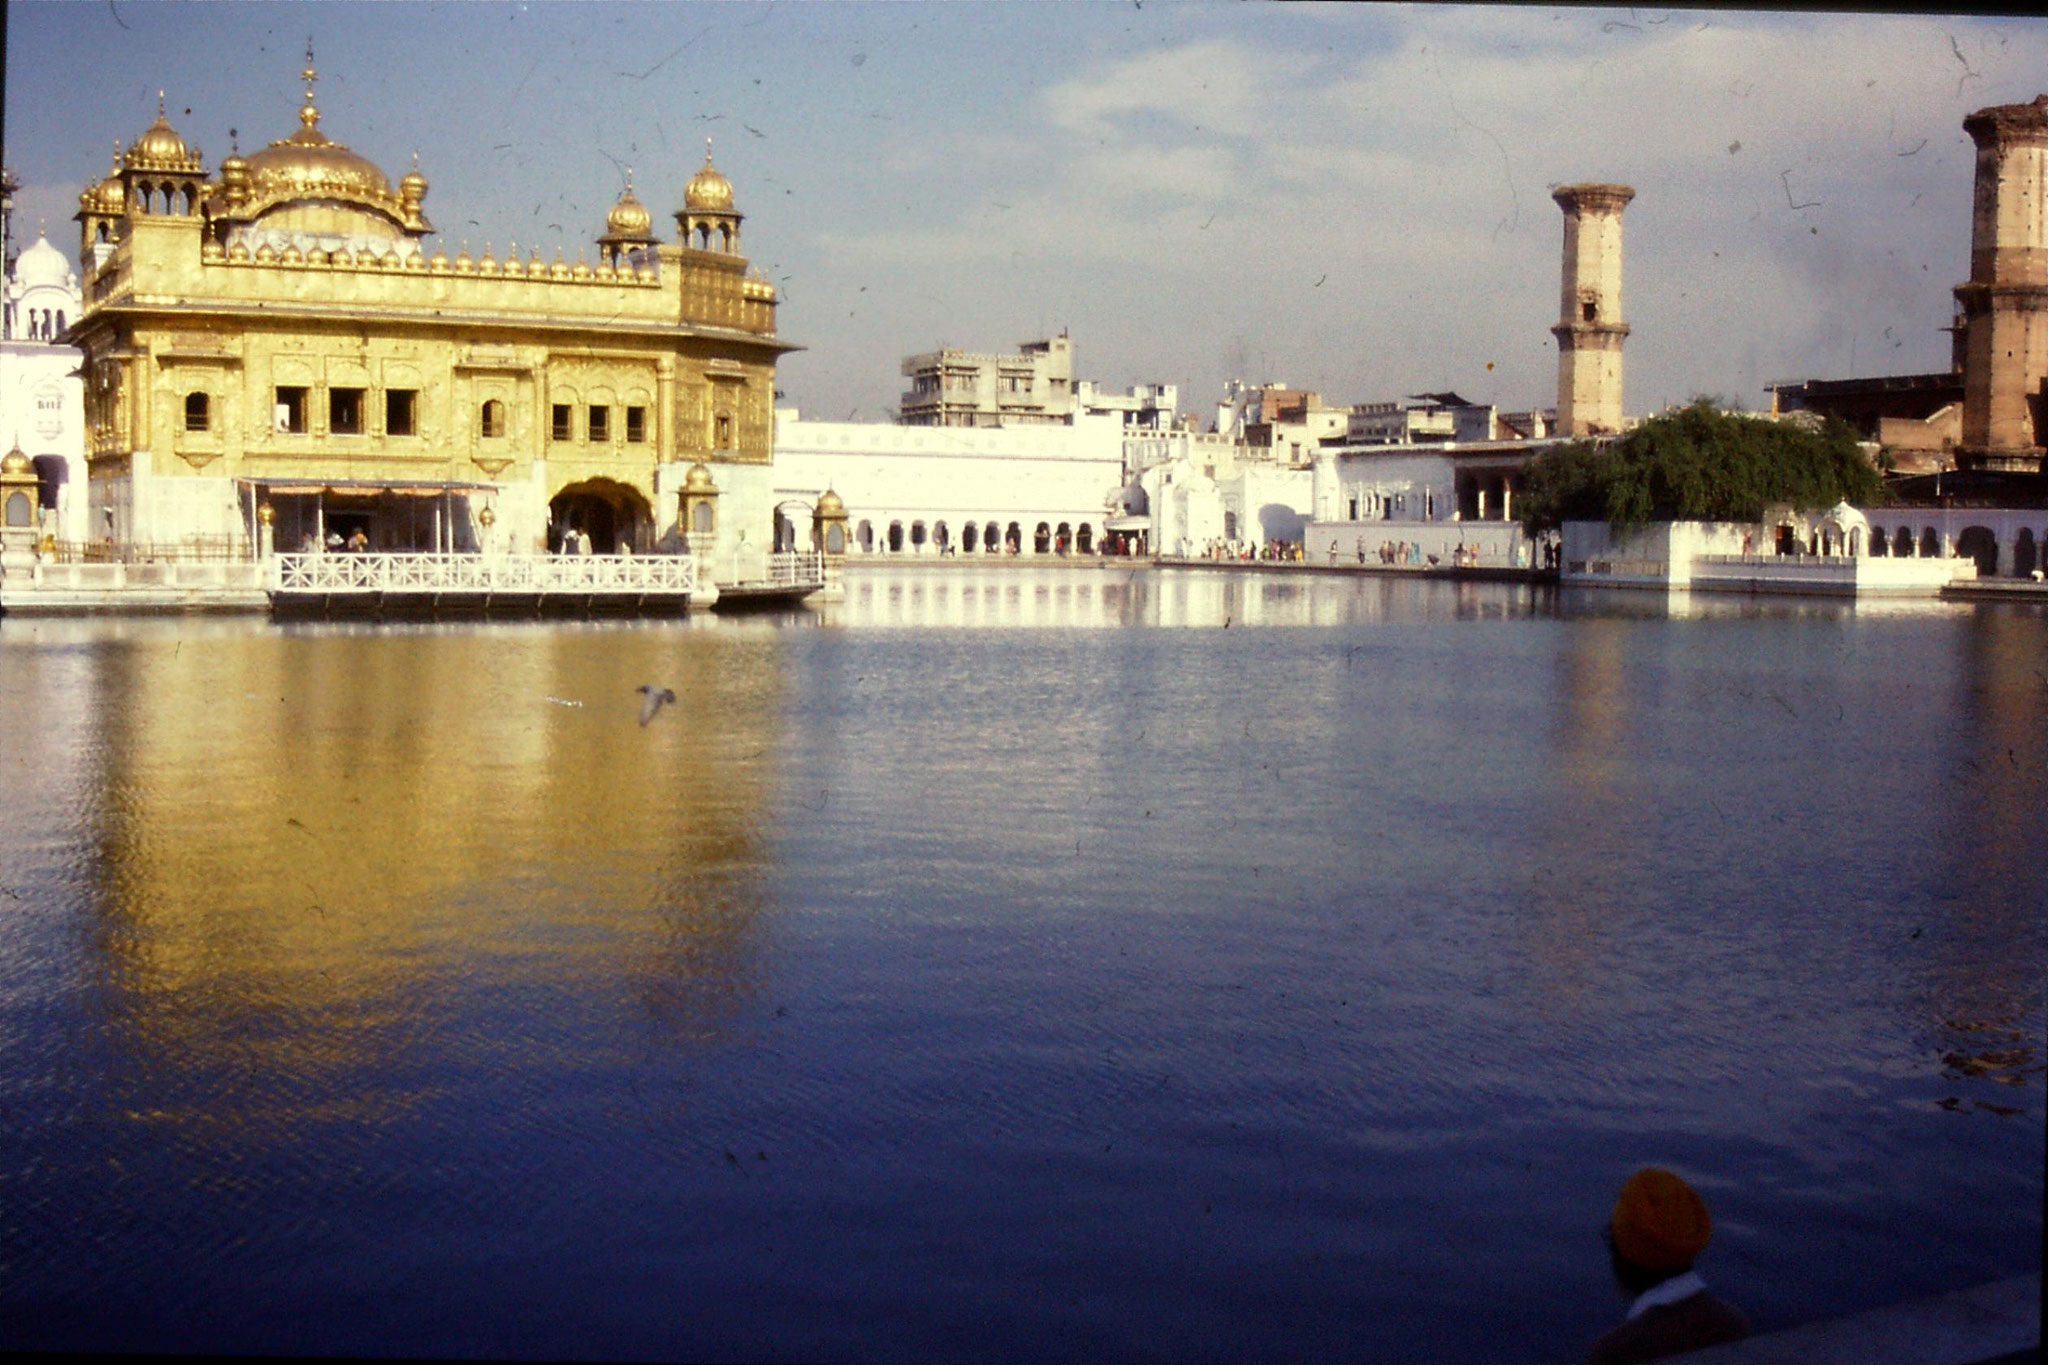 17/11/1989: 14: Amritsar Golden Temple